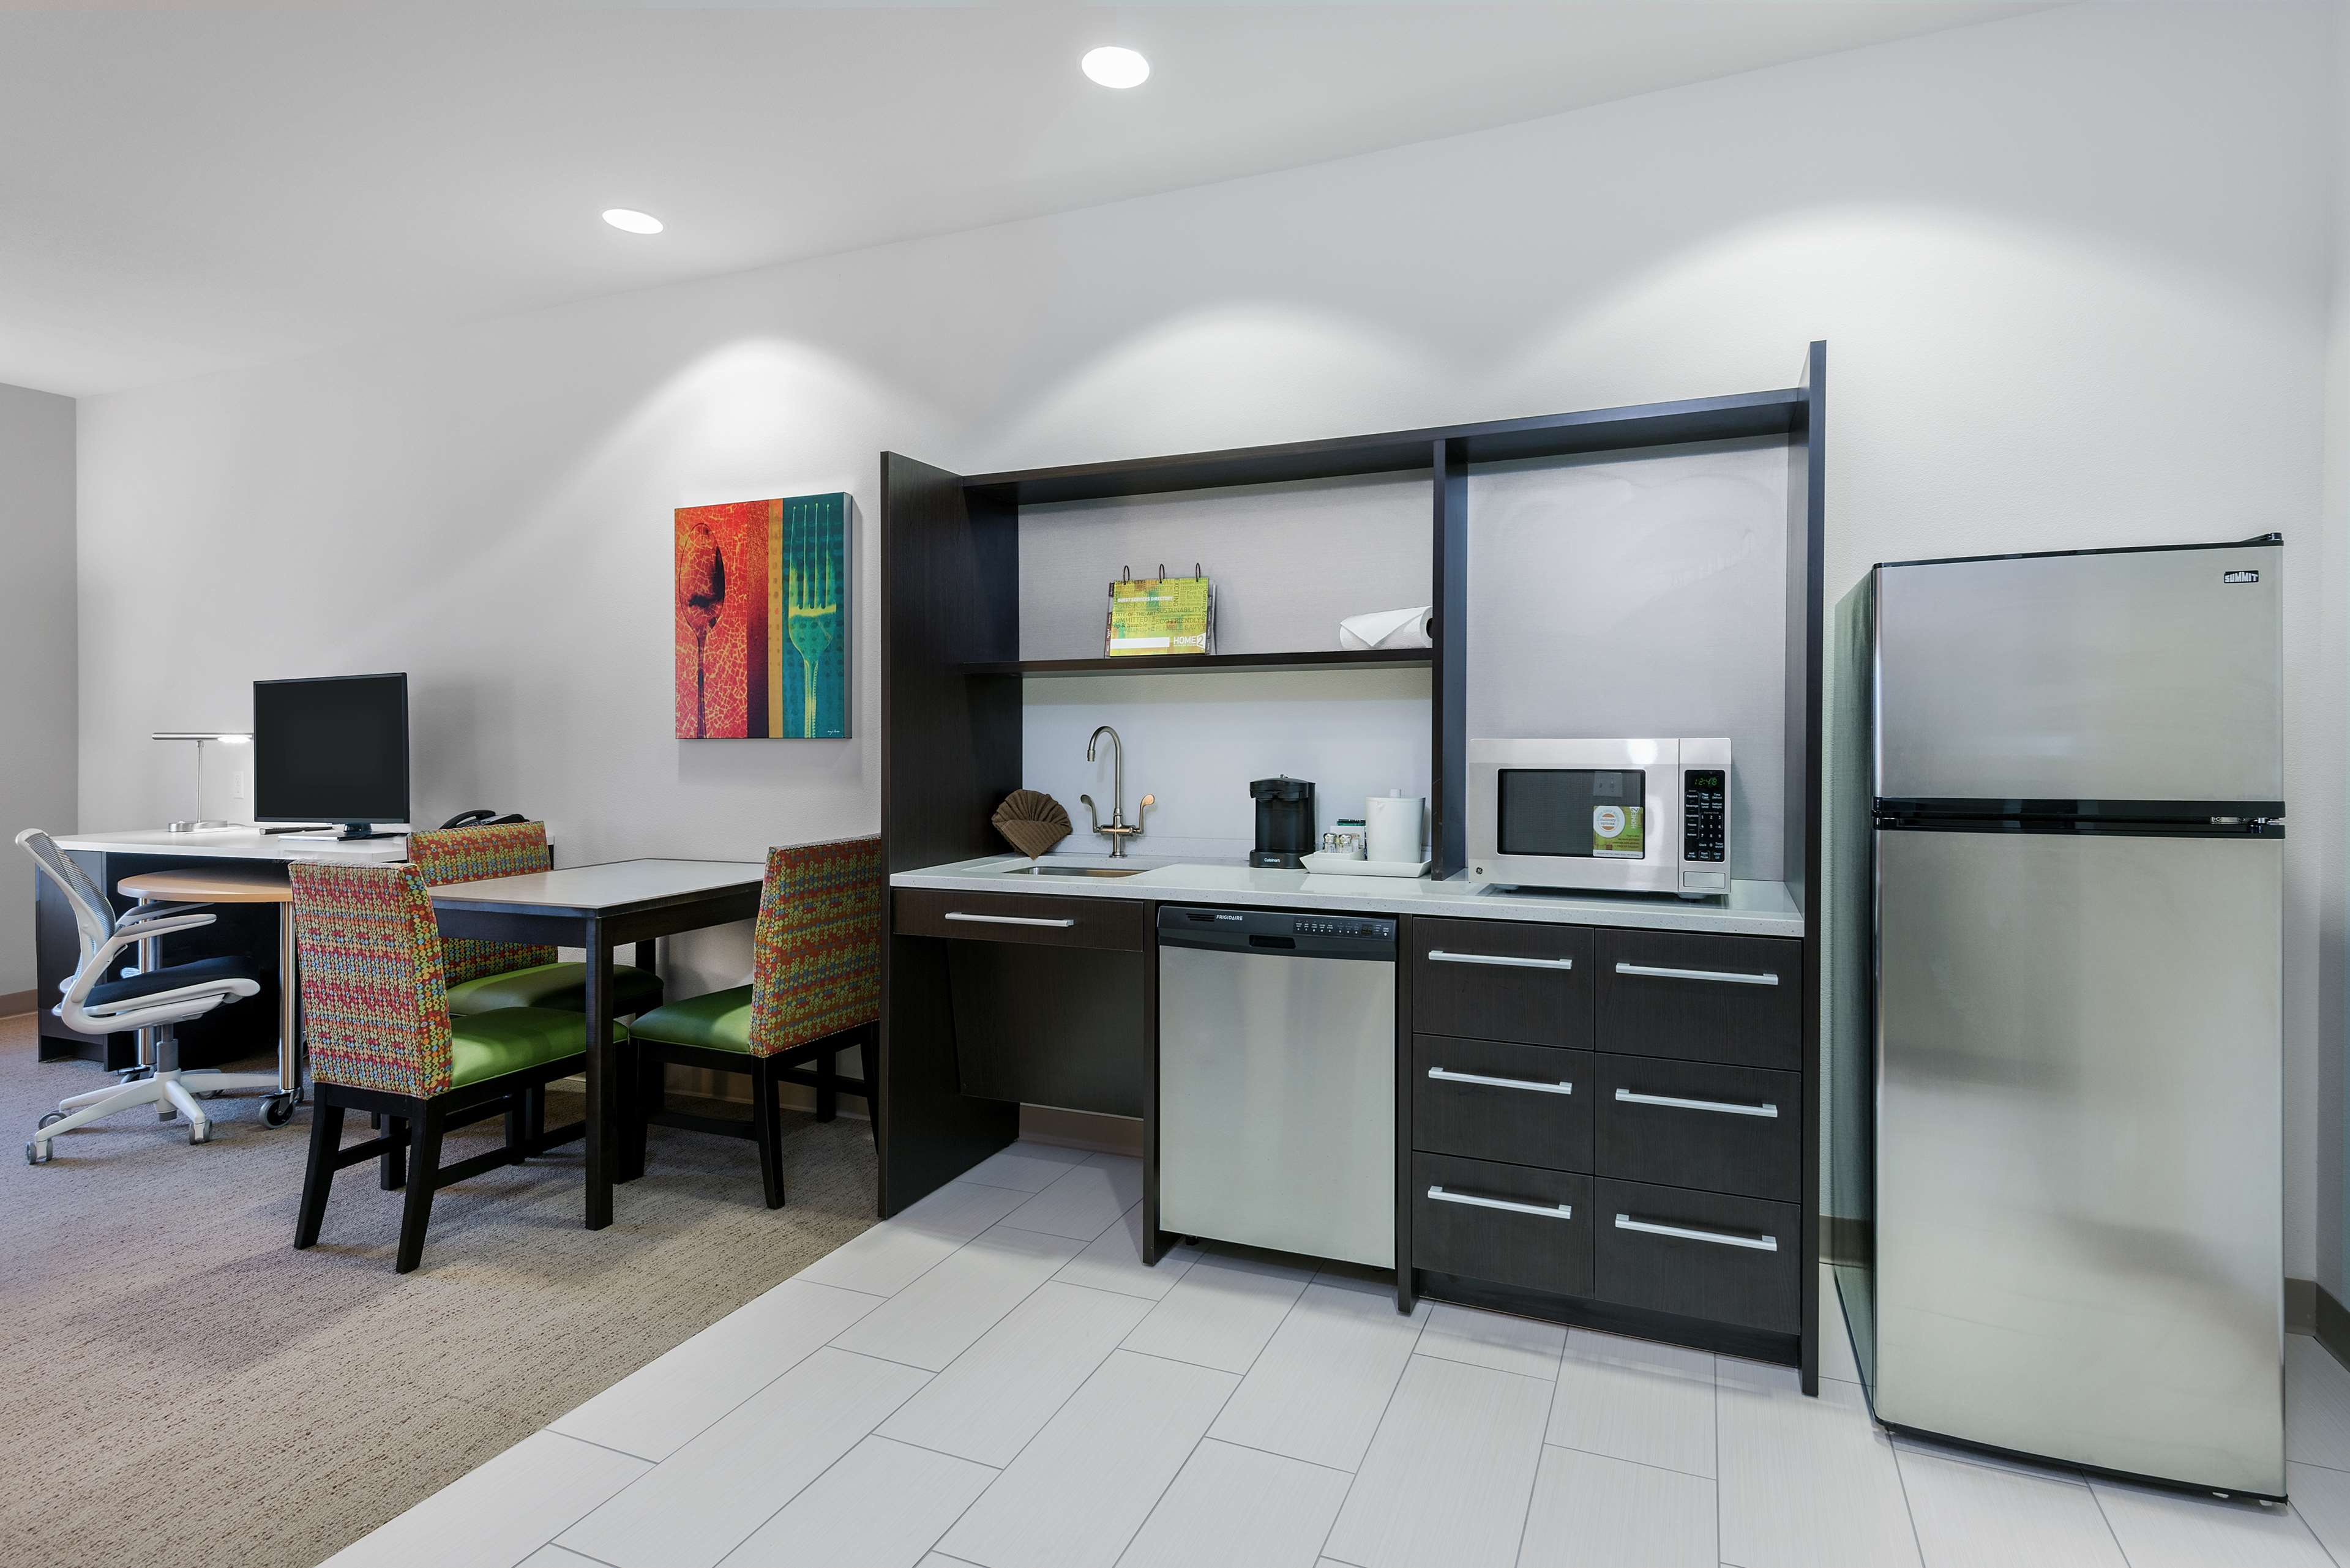 Home2 Suites by Hilton Austin Airport image 30